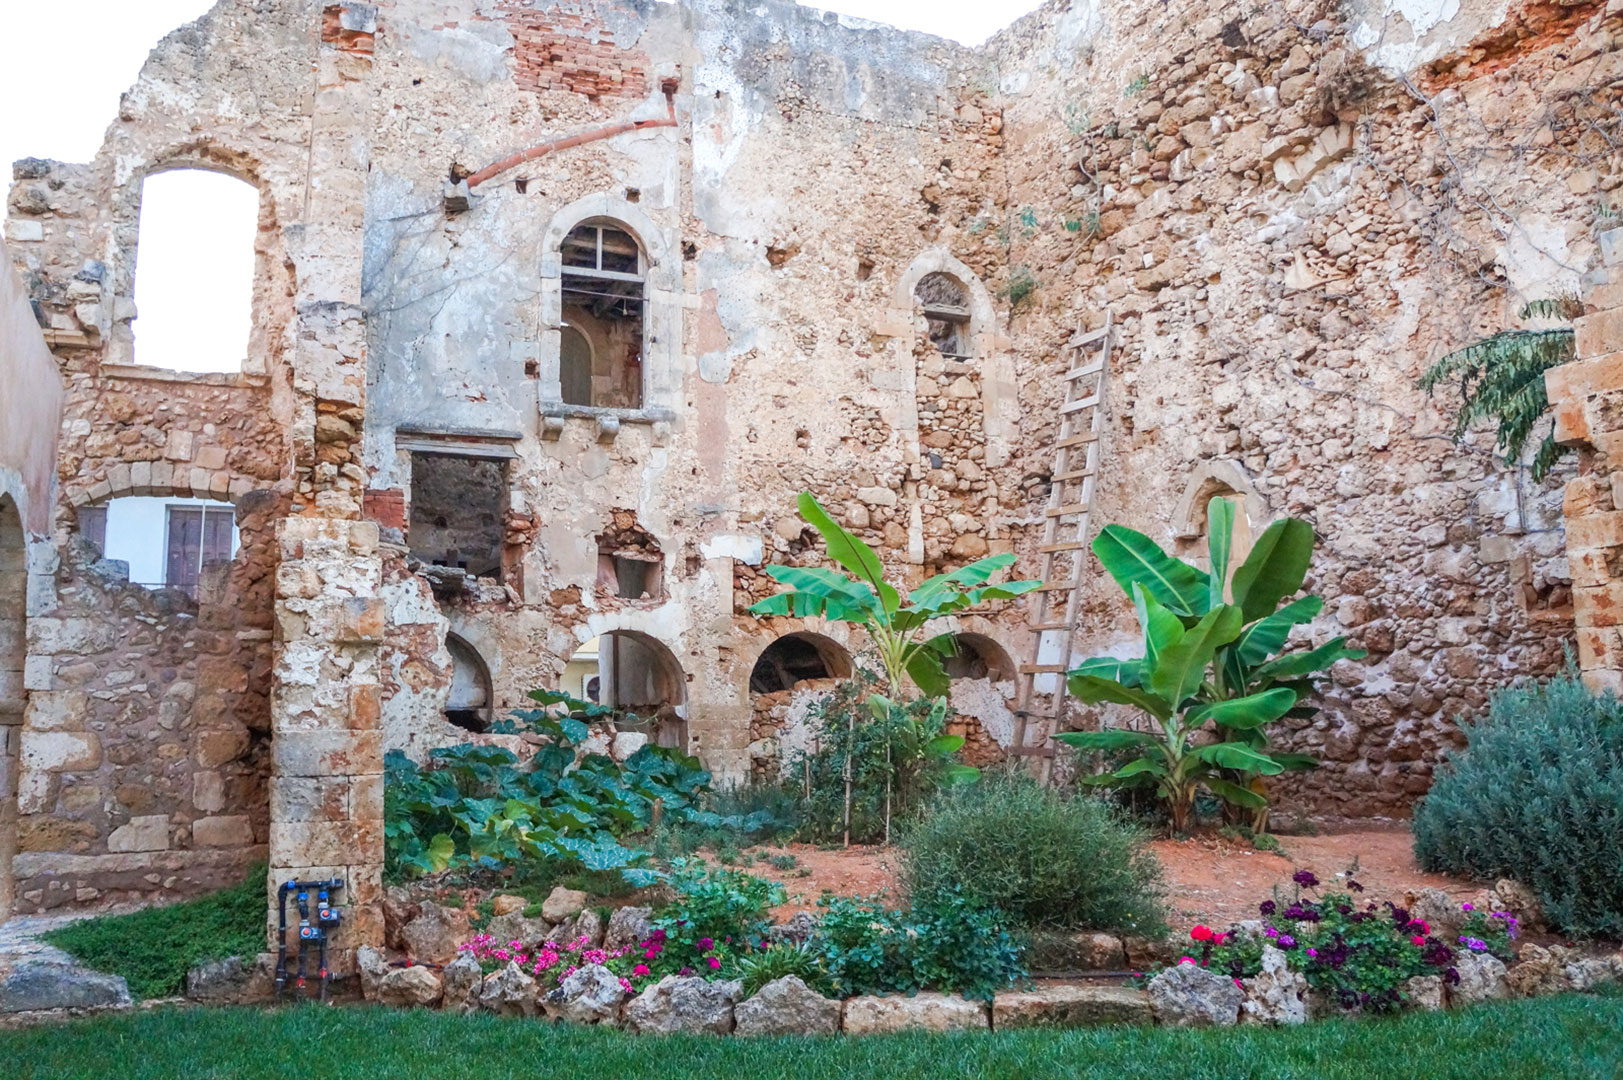 chania-crete-greece-la-vie-en-blog-all-rights-reserved-7